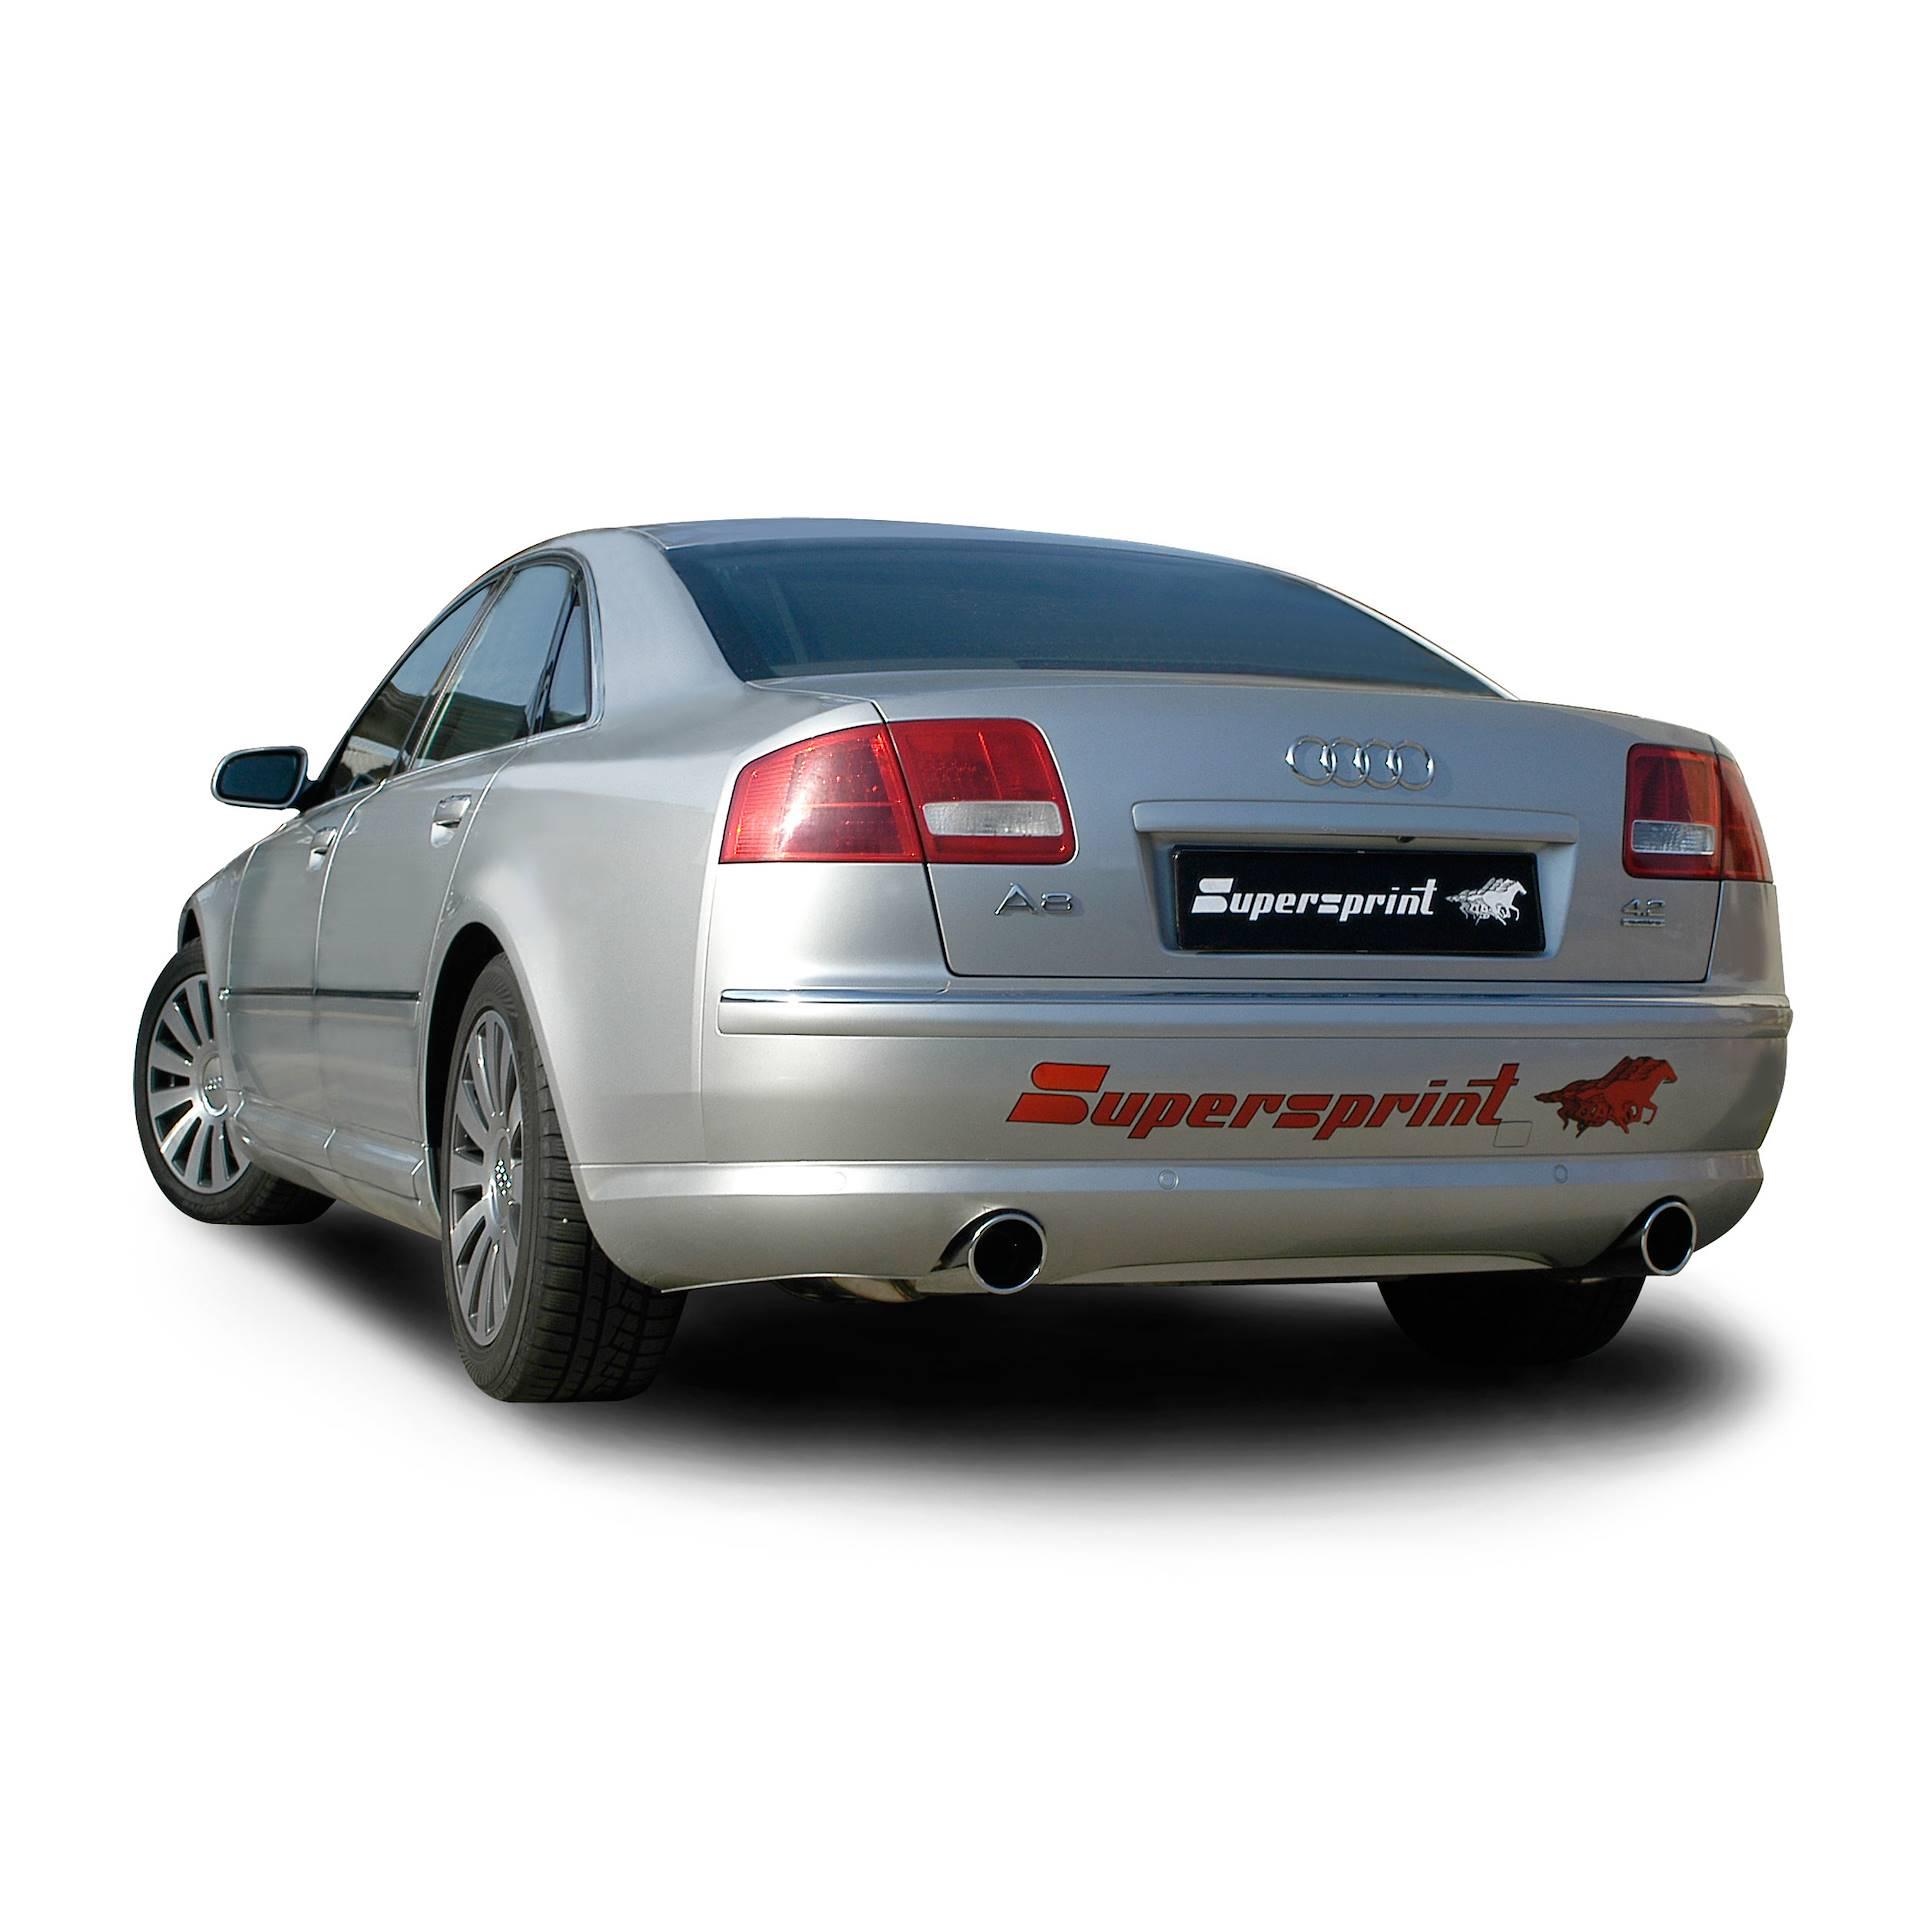 Kekurangan Audi A8 4.2 Quattro Top Model Tahun Ini